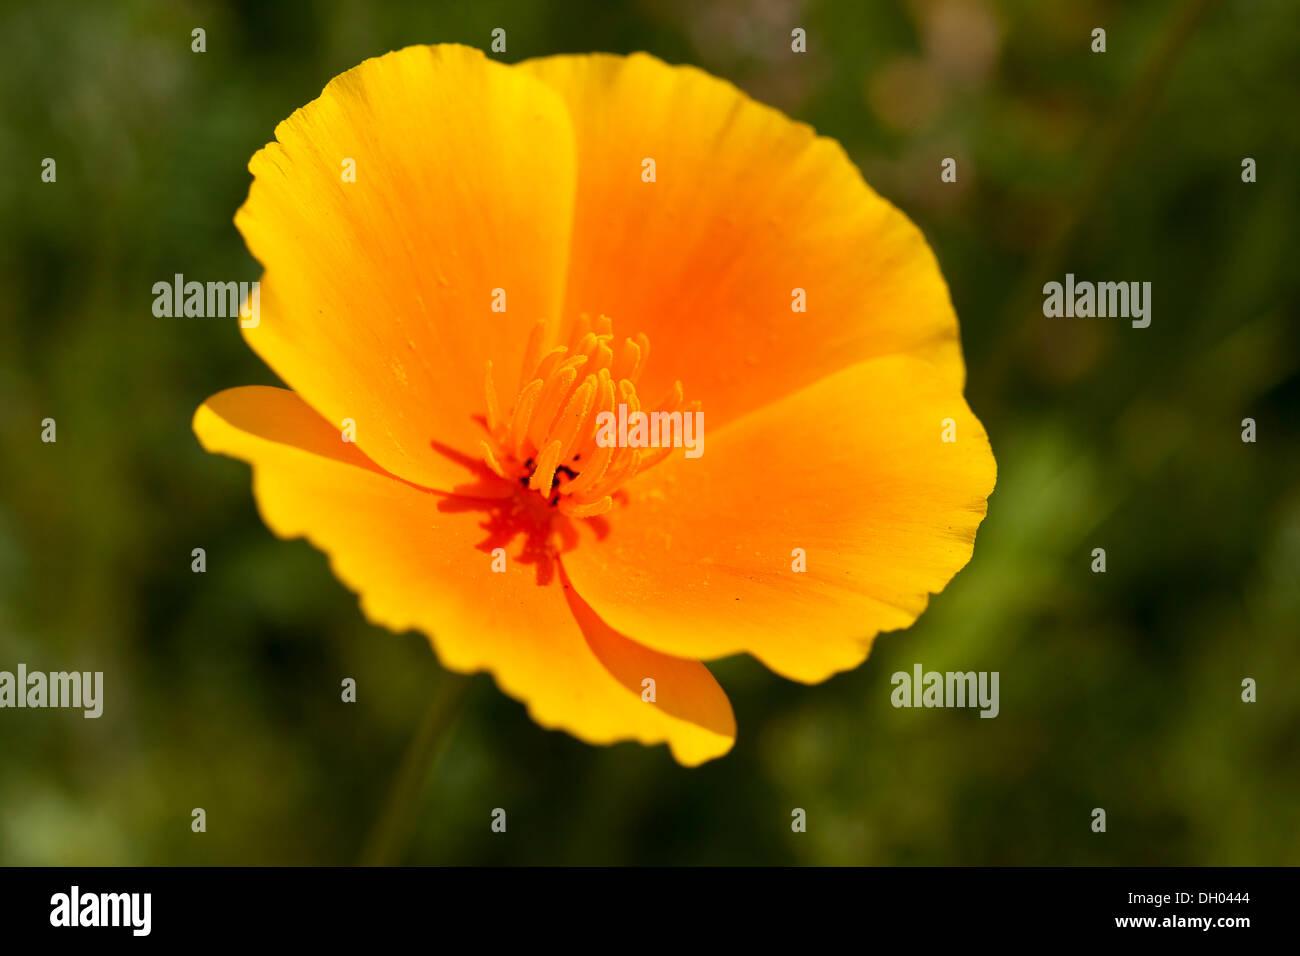 California Poppy (Eschscholzia californica), close-up of a flower - Stock Image